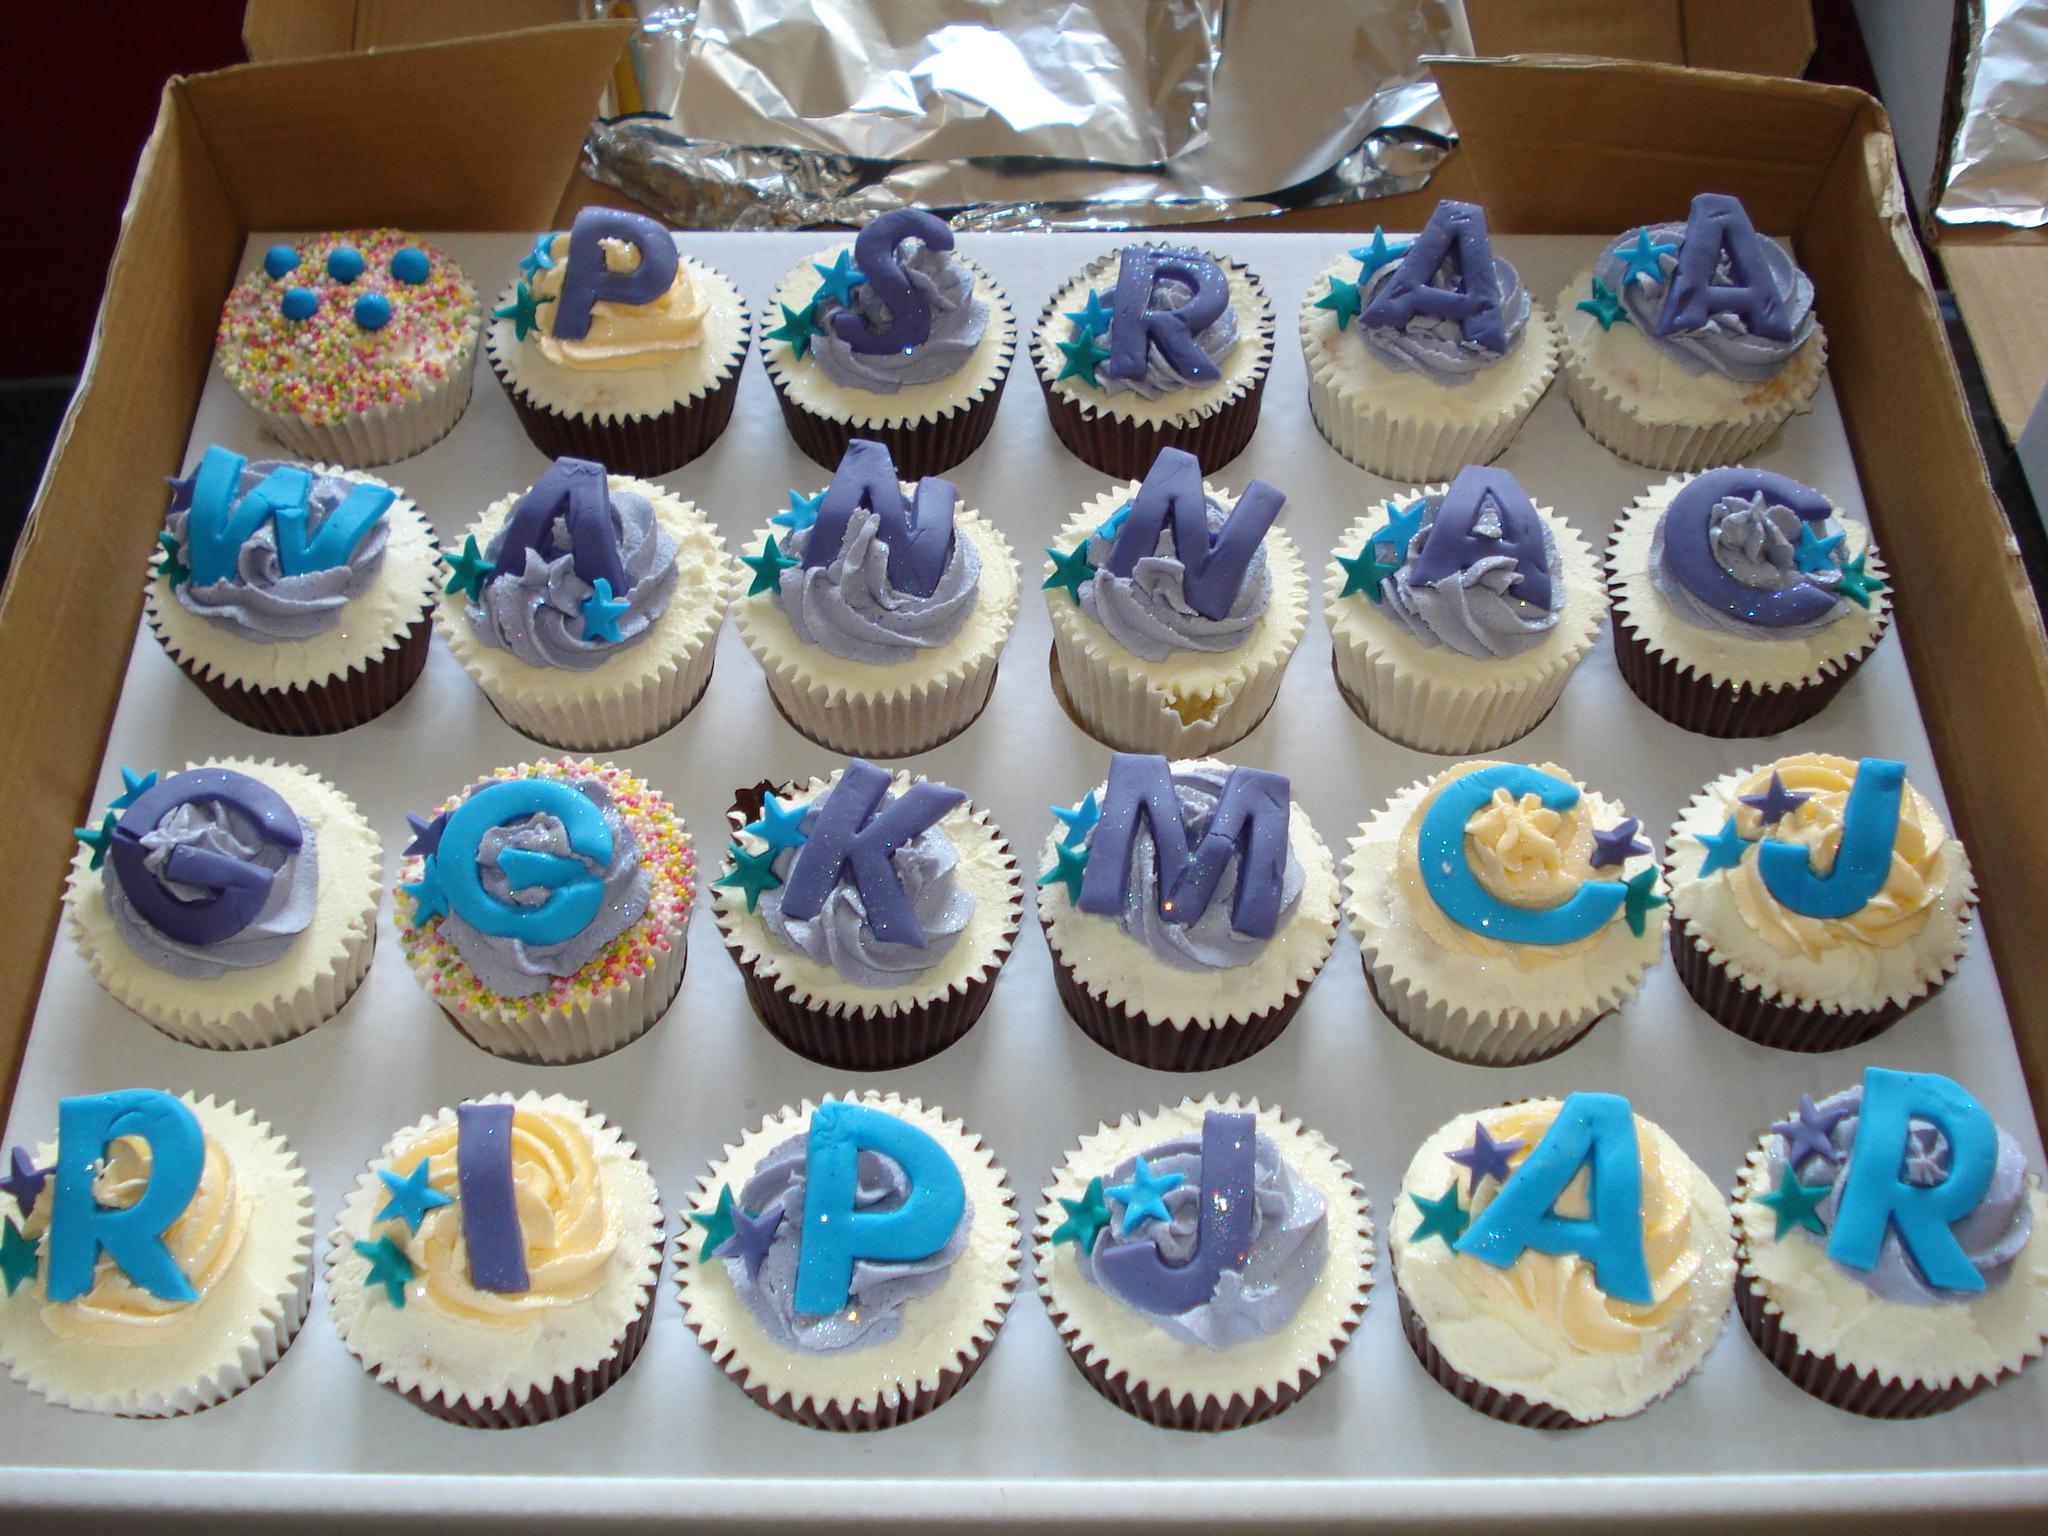 The boys cupcakes